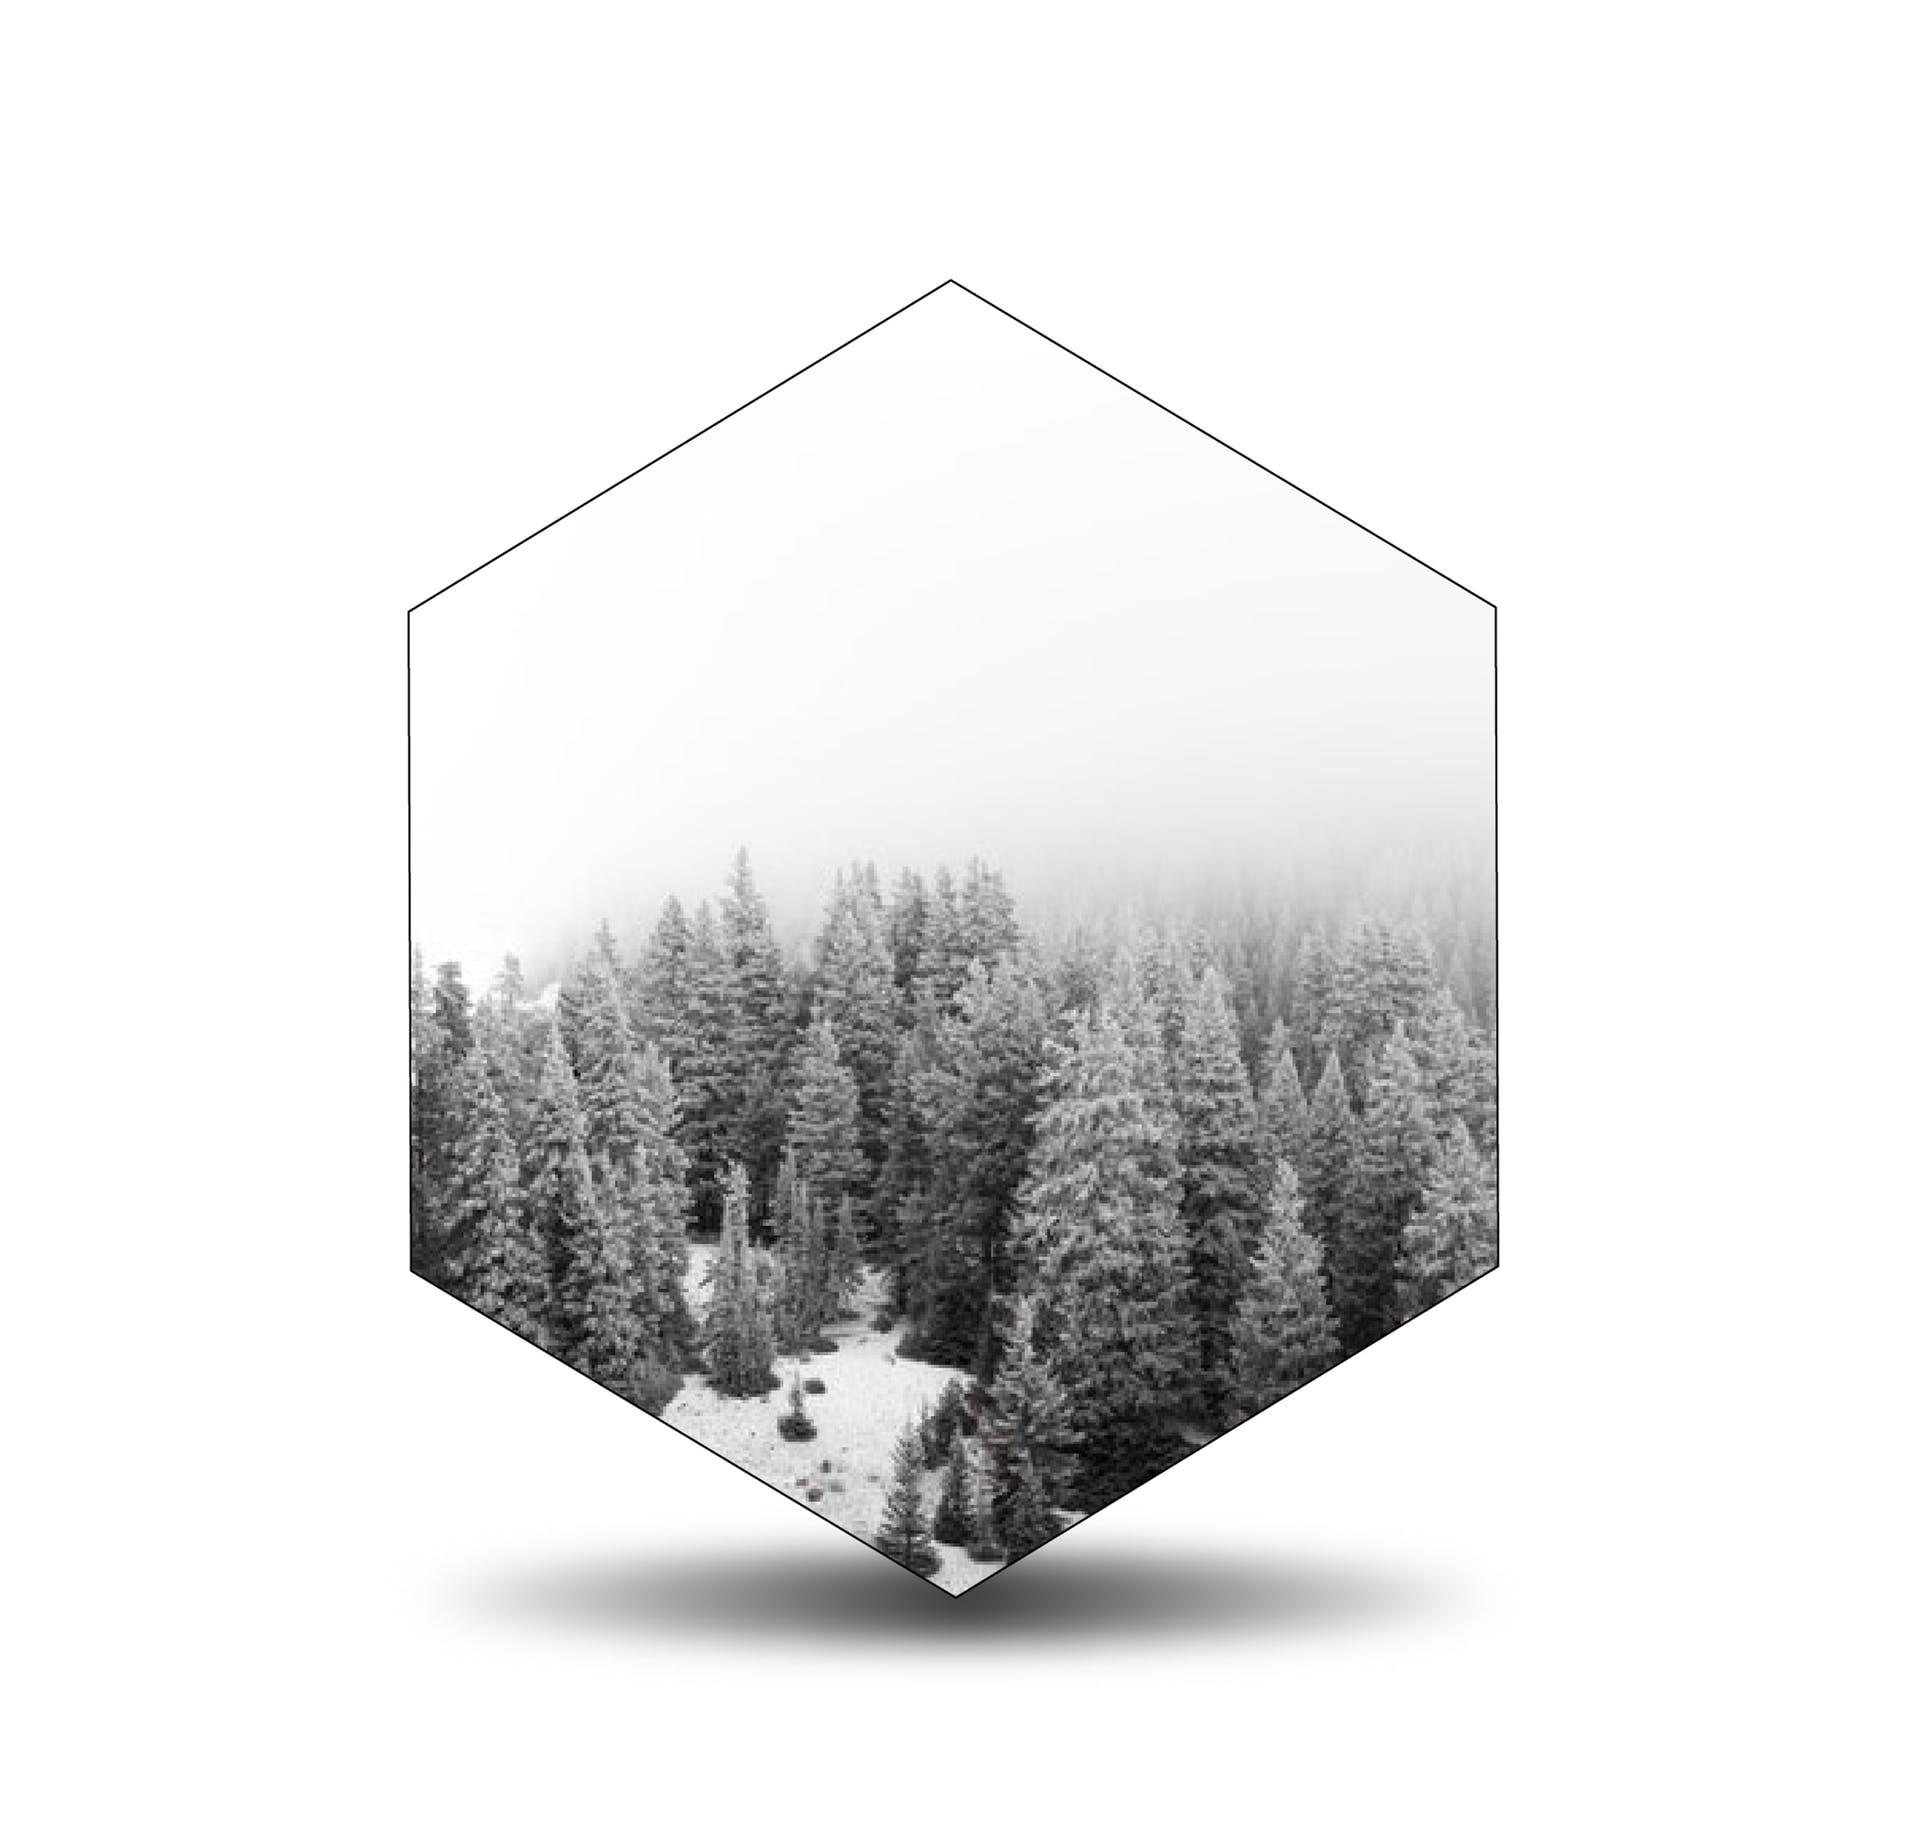 geometric pattern shapes trees